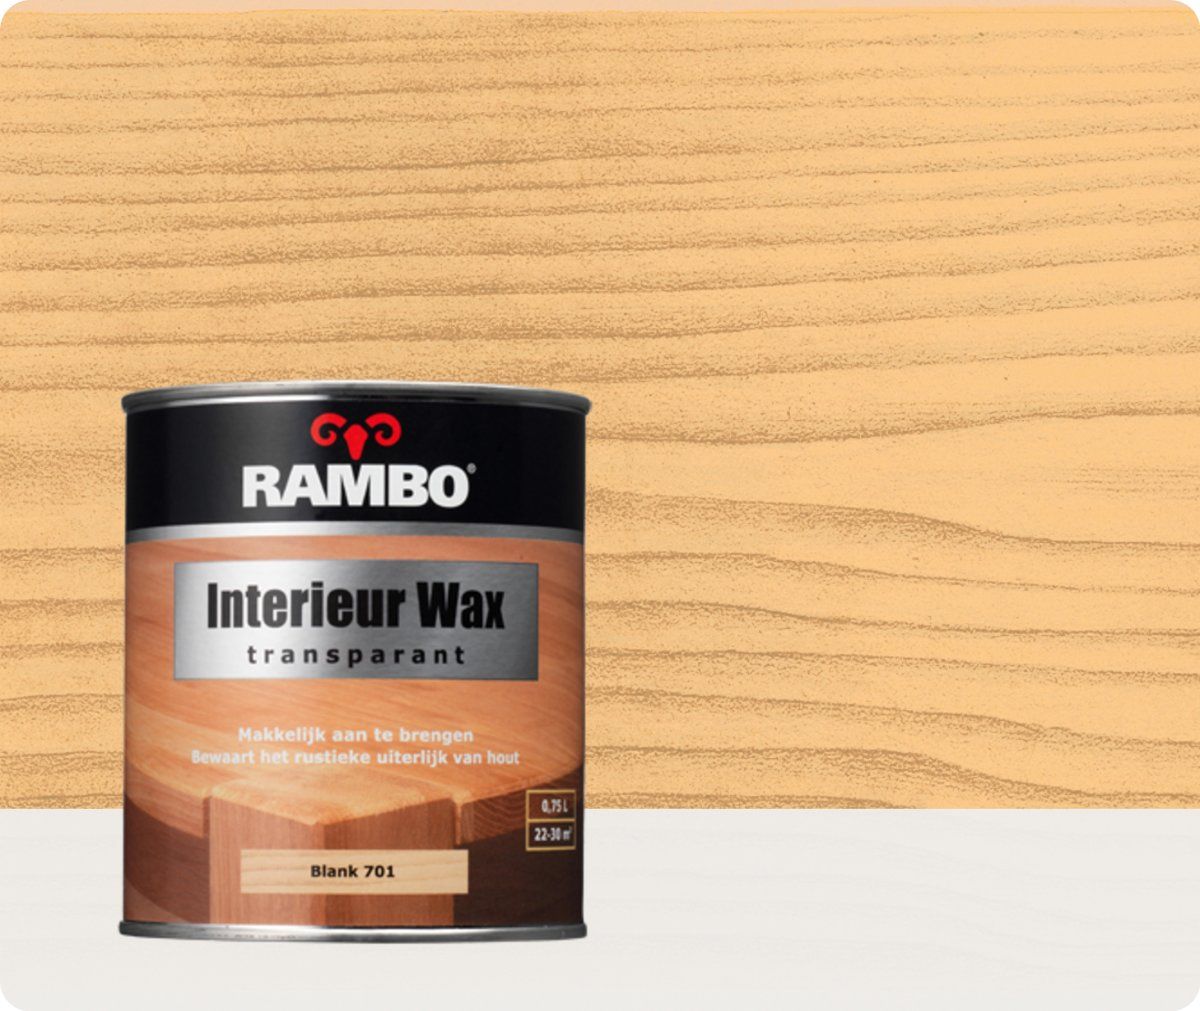 Rambo Interieur Wax Transparant 701 Blank kopen